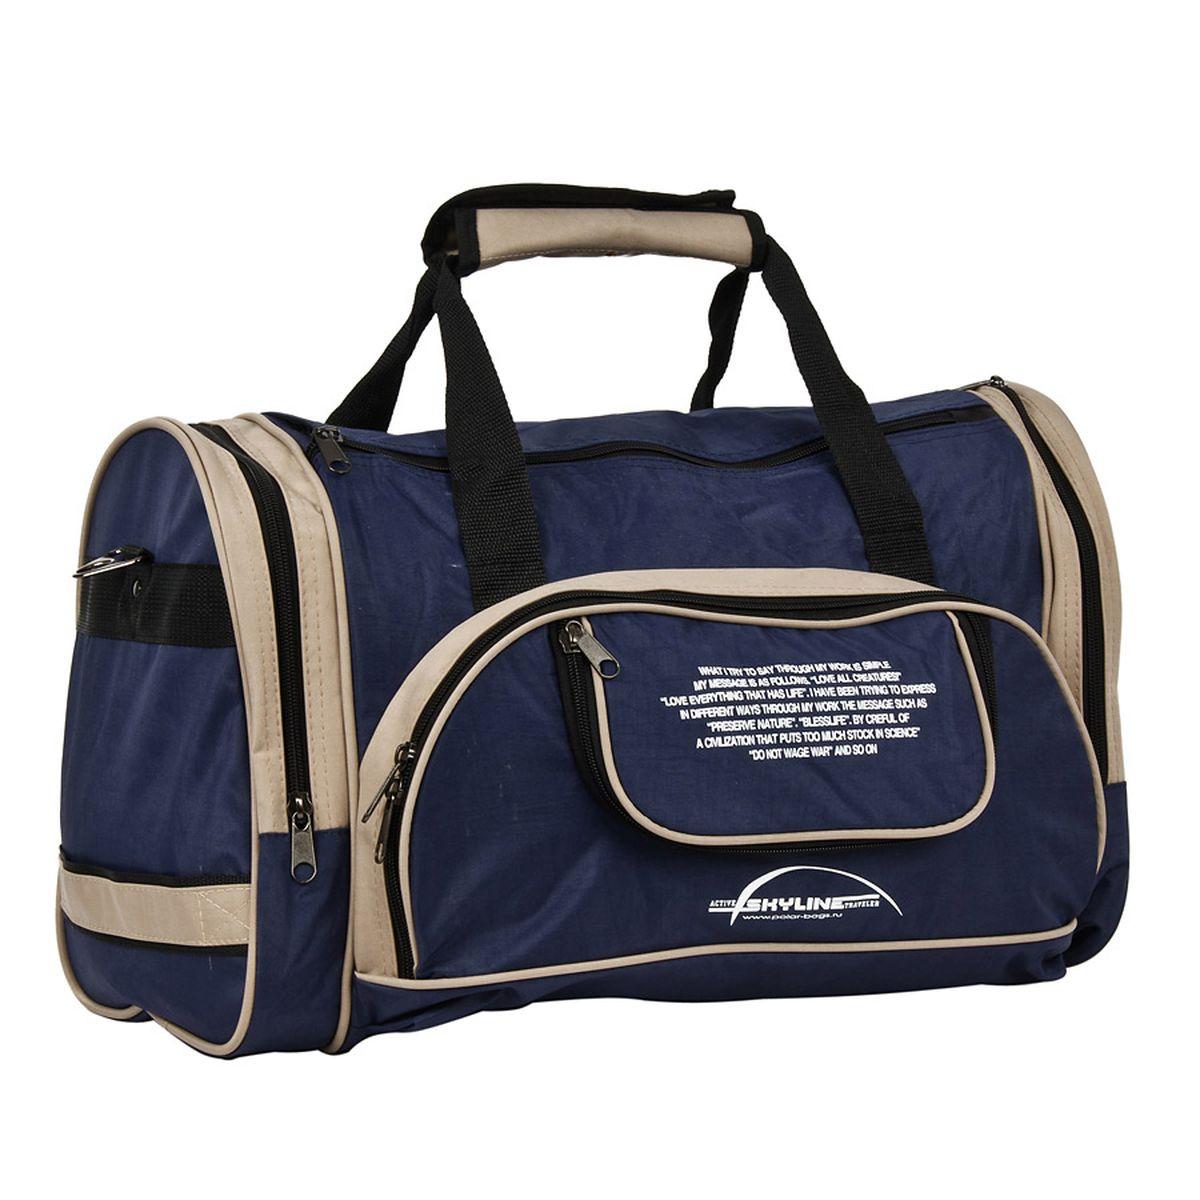 Сумка спортивная Polar, цвет: синий, бежевый, 37,5 л. 6065 сумка спортивная polar цвет темно синий 46 5 л 5986